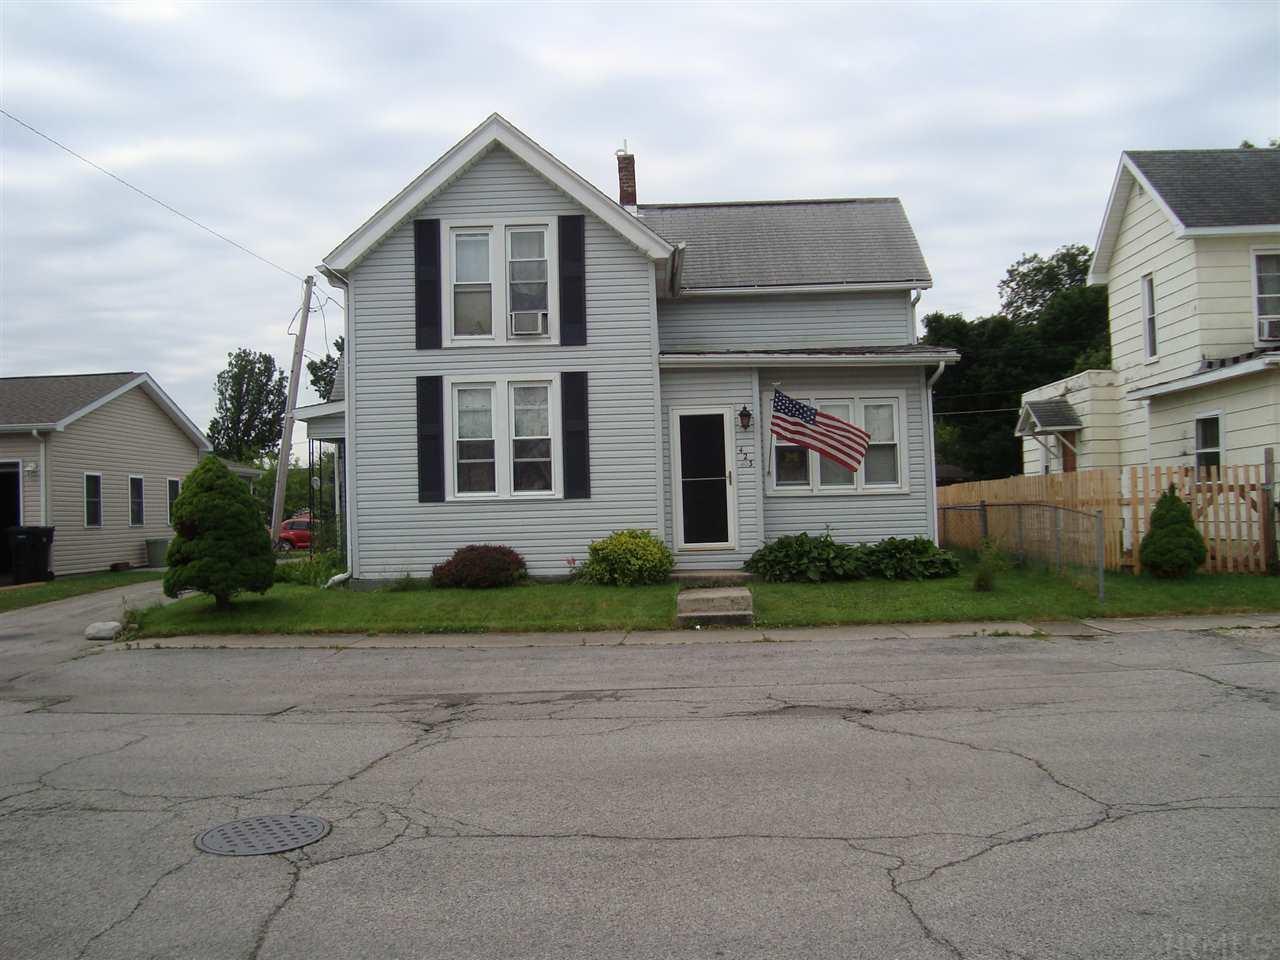 423 Indiana, Huntington, IN 46750